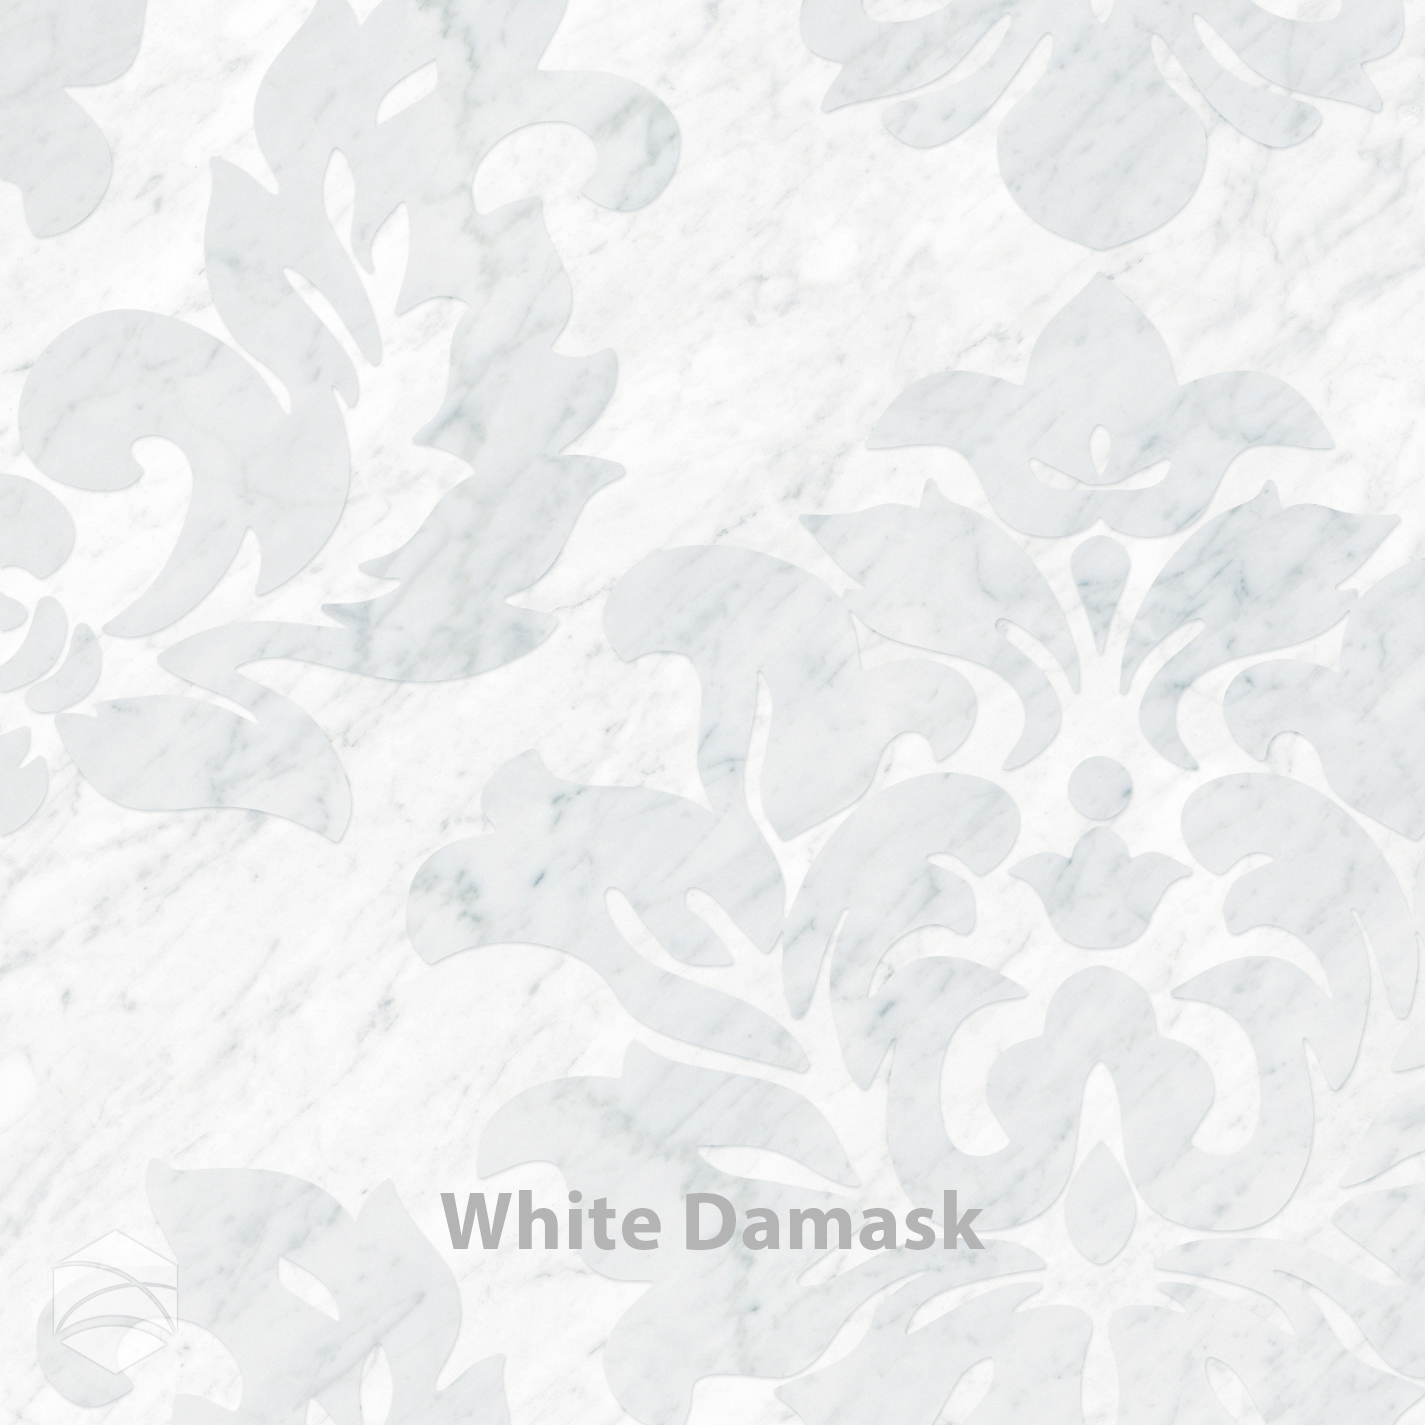 White Damask_V2_14x14.jpg